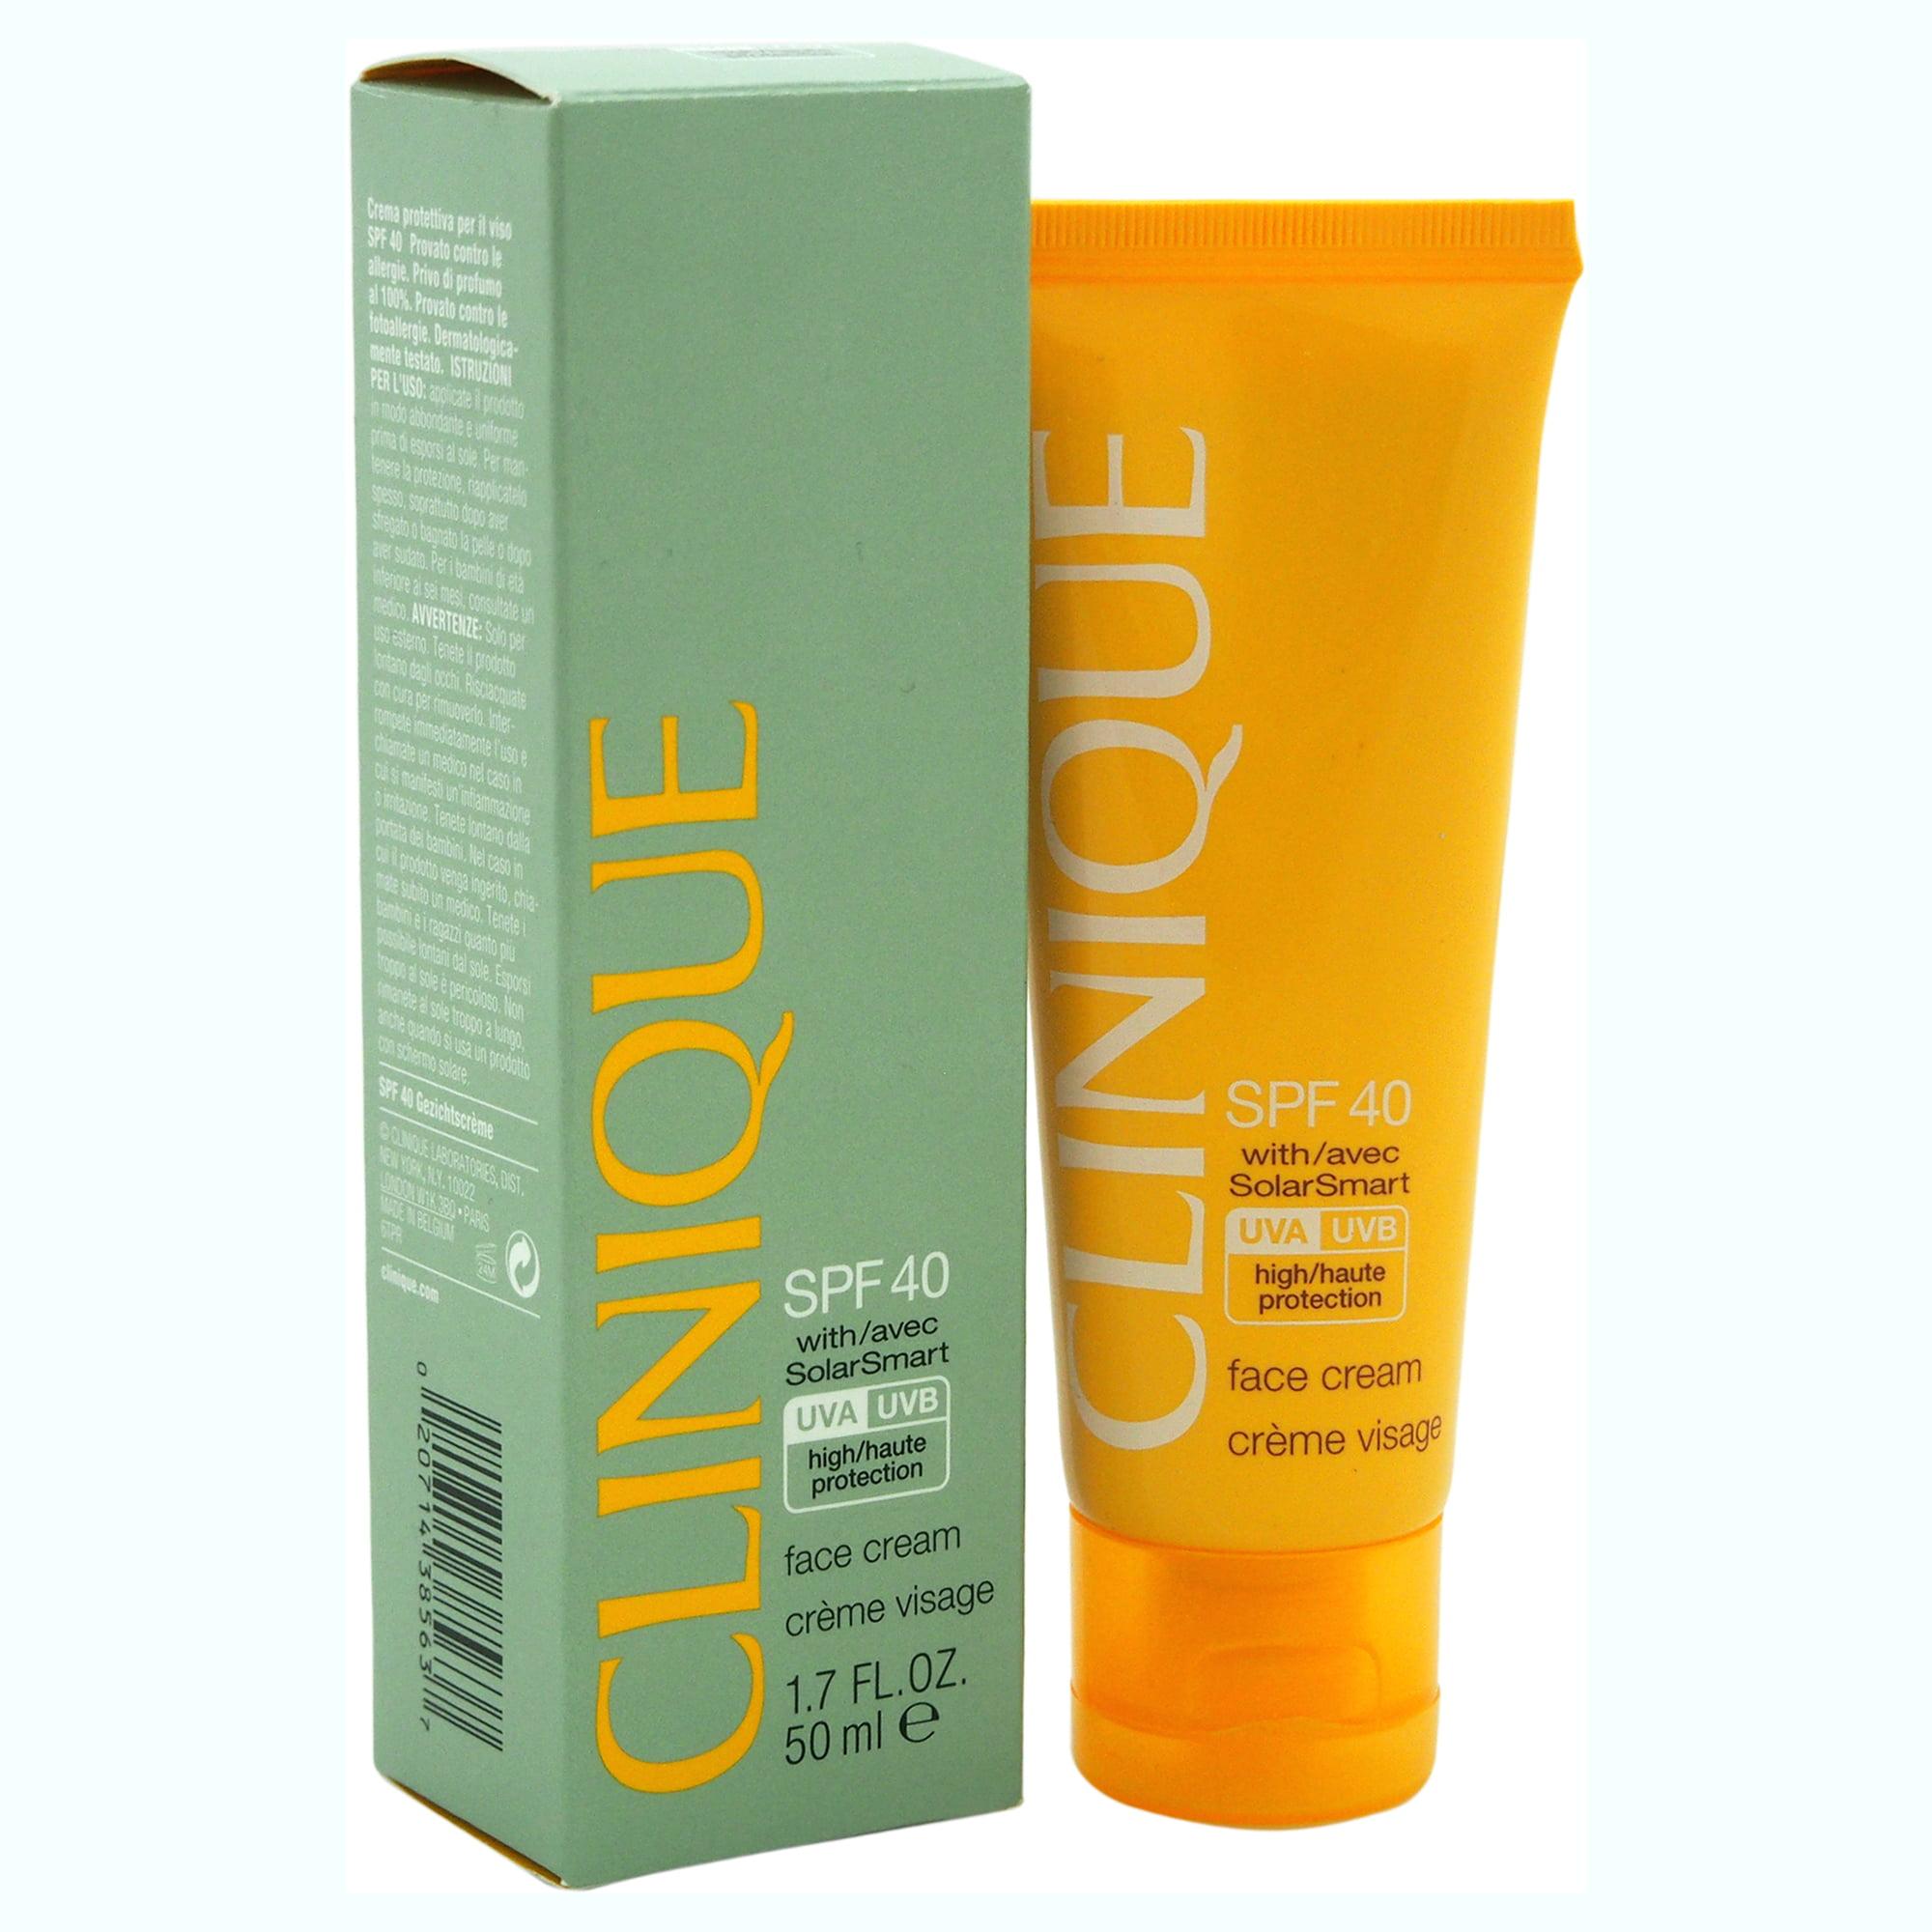 Clinique Face Cream SPF 40 by Clinique for Unisex - 1.7 oz Sunscreen